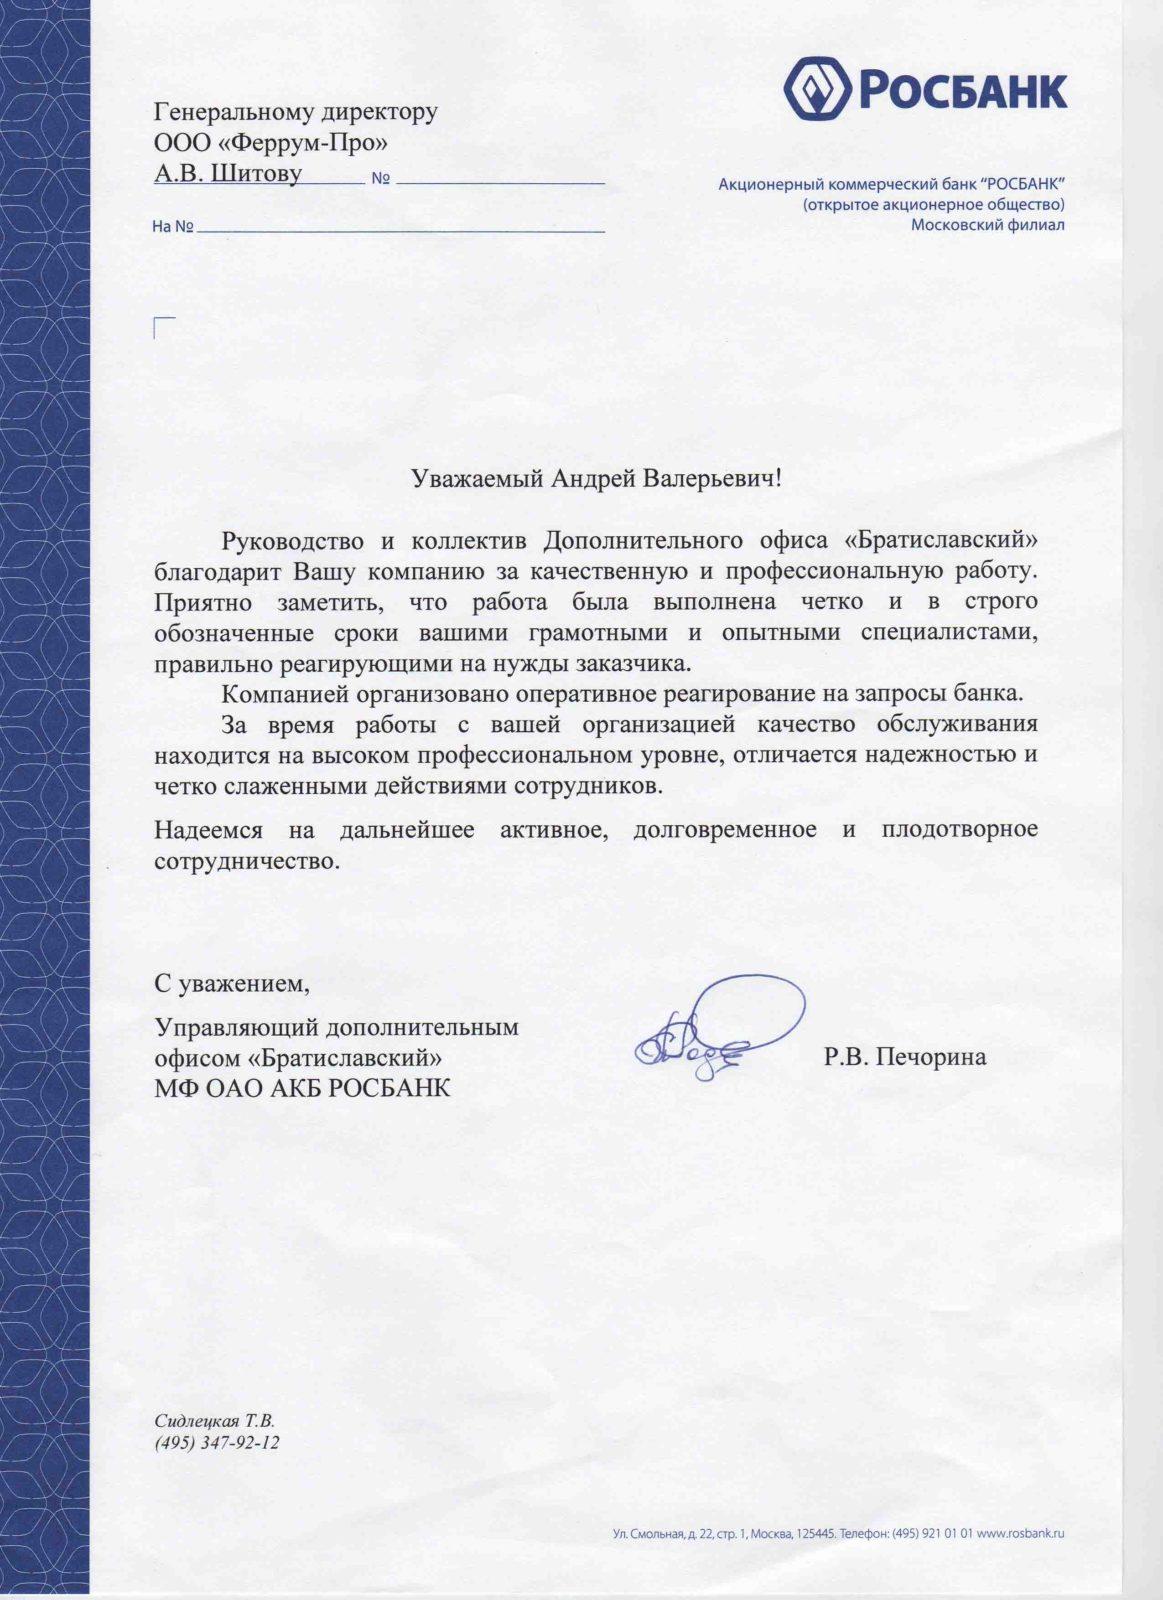 Rosbank016